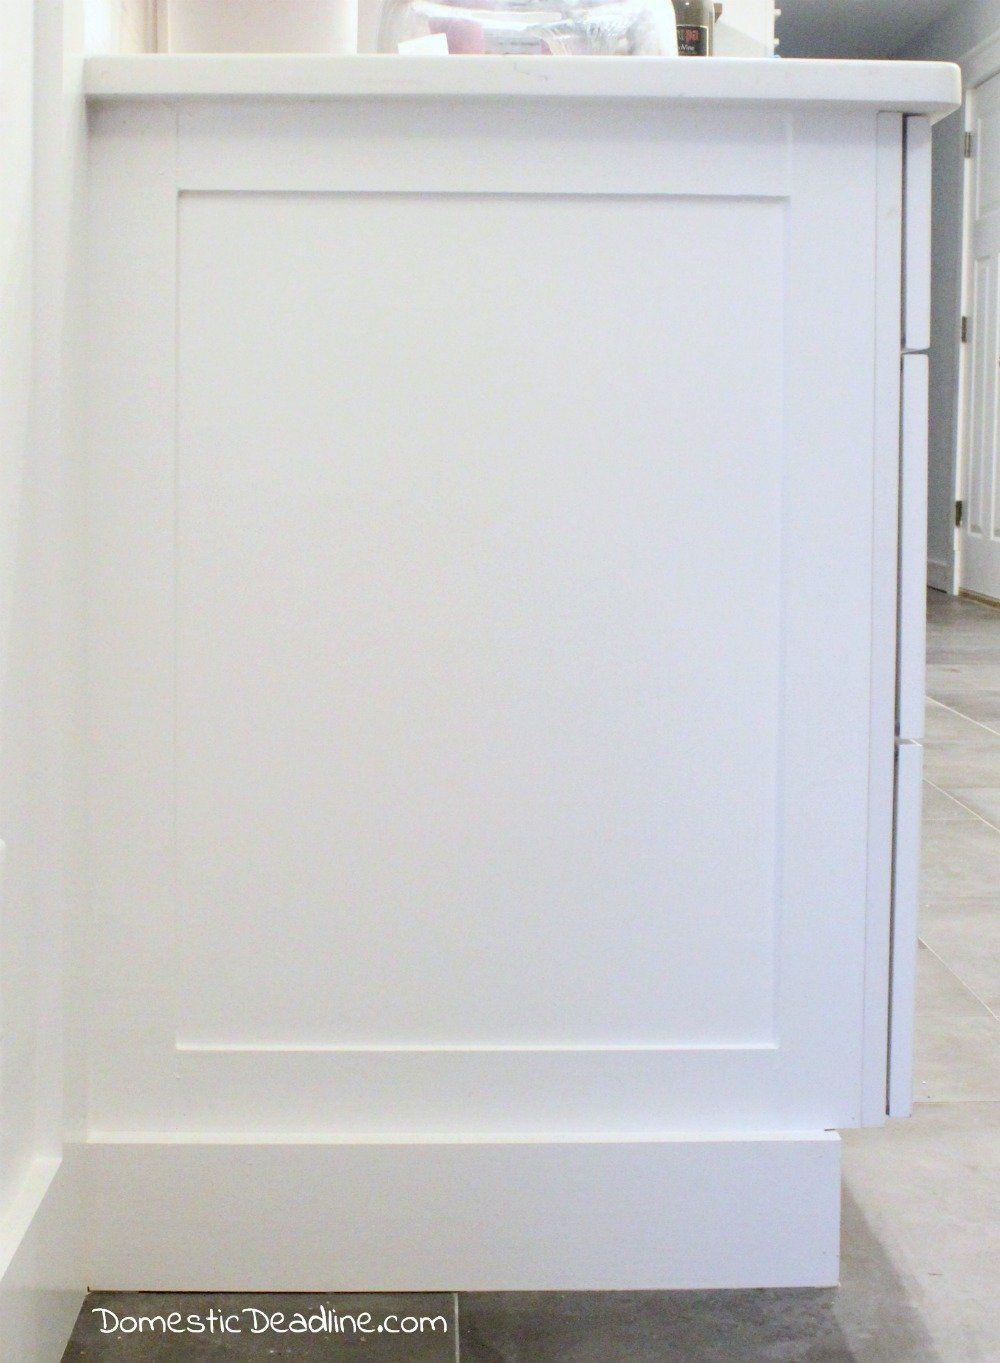 Diy Cabinet End Panels Domestic Deadline Kitchen Cabinets End Panels Fixer Upper Kitchen Upper Kitchen Cabinets